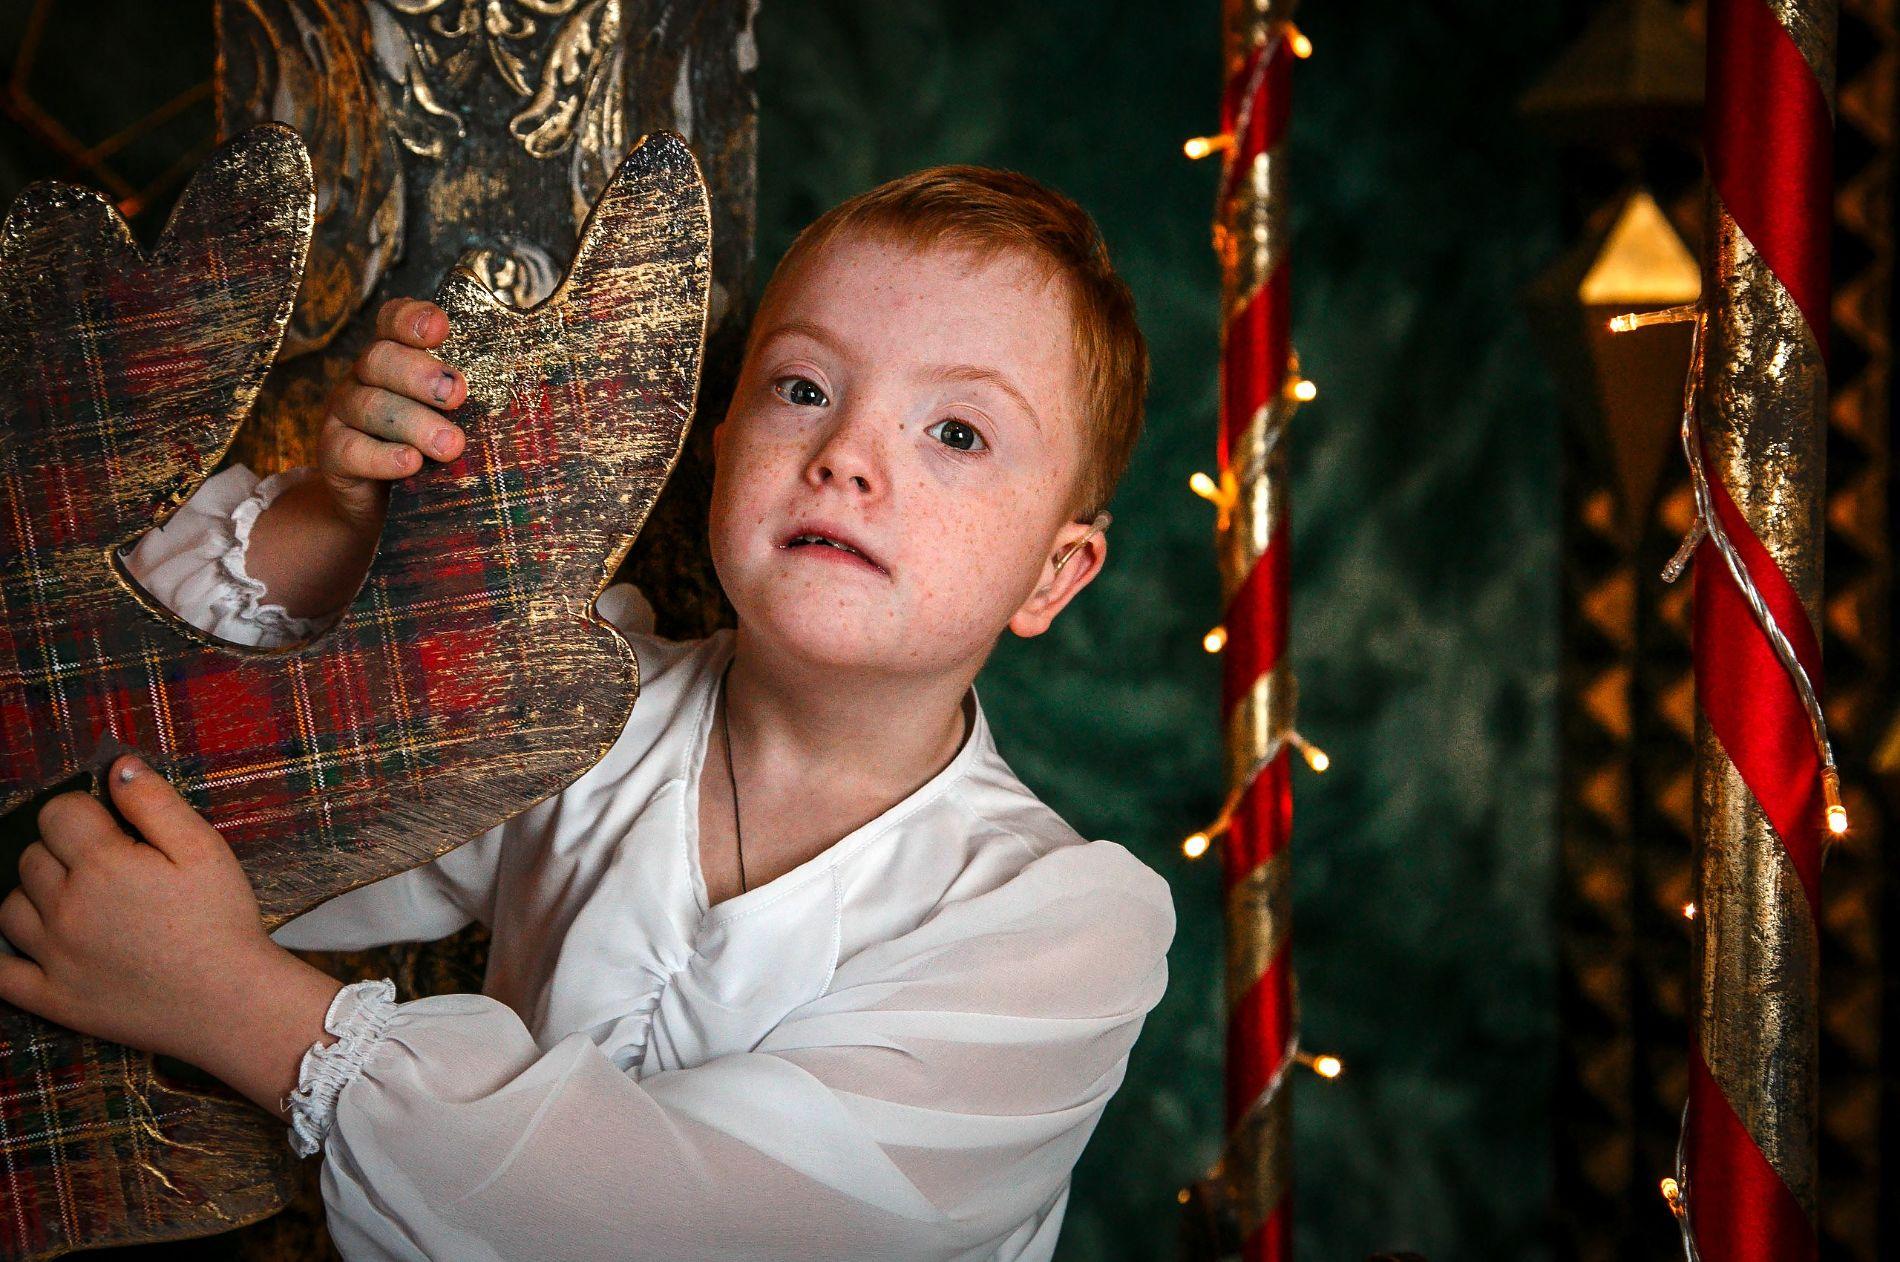 Адаптация для детей с синдромом дауна краснодар thumbnail